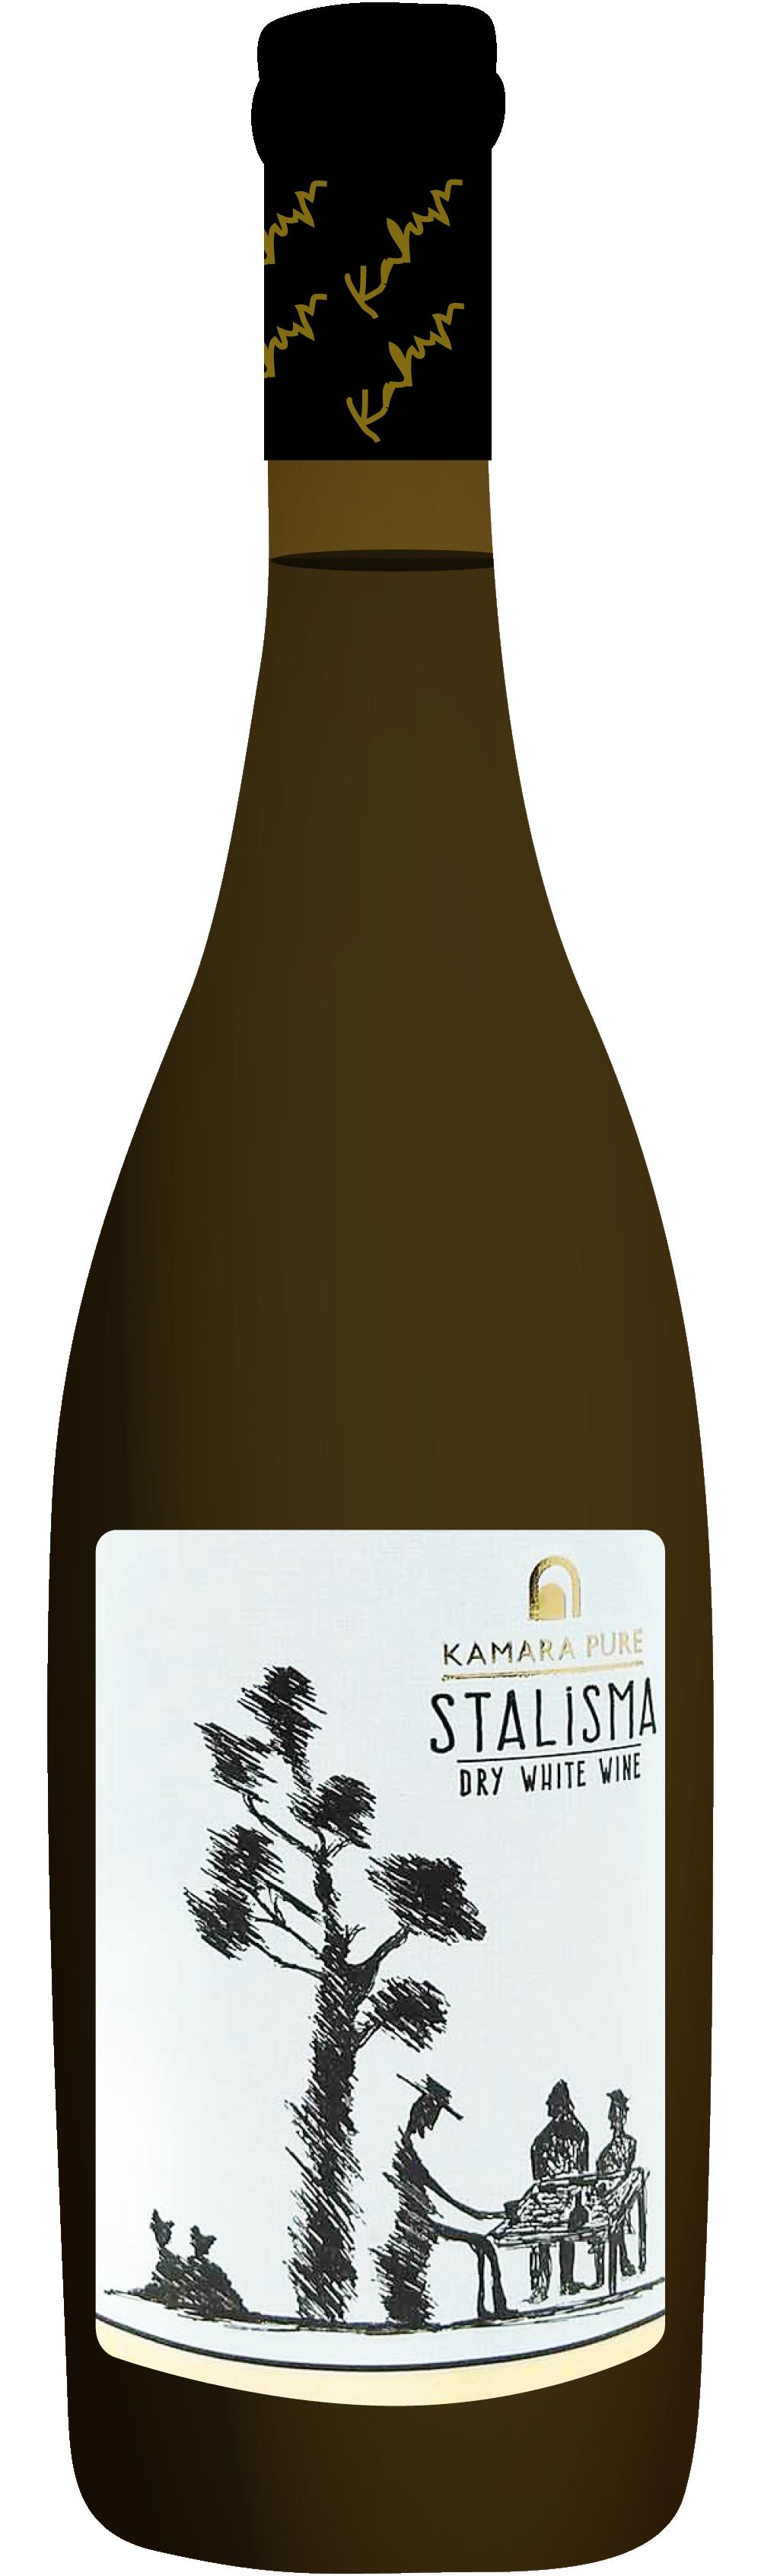 the natural wine company club may 2021 greece kamara winery stalisma 2019